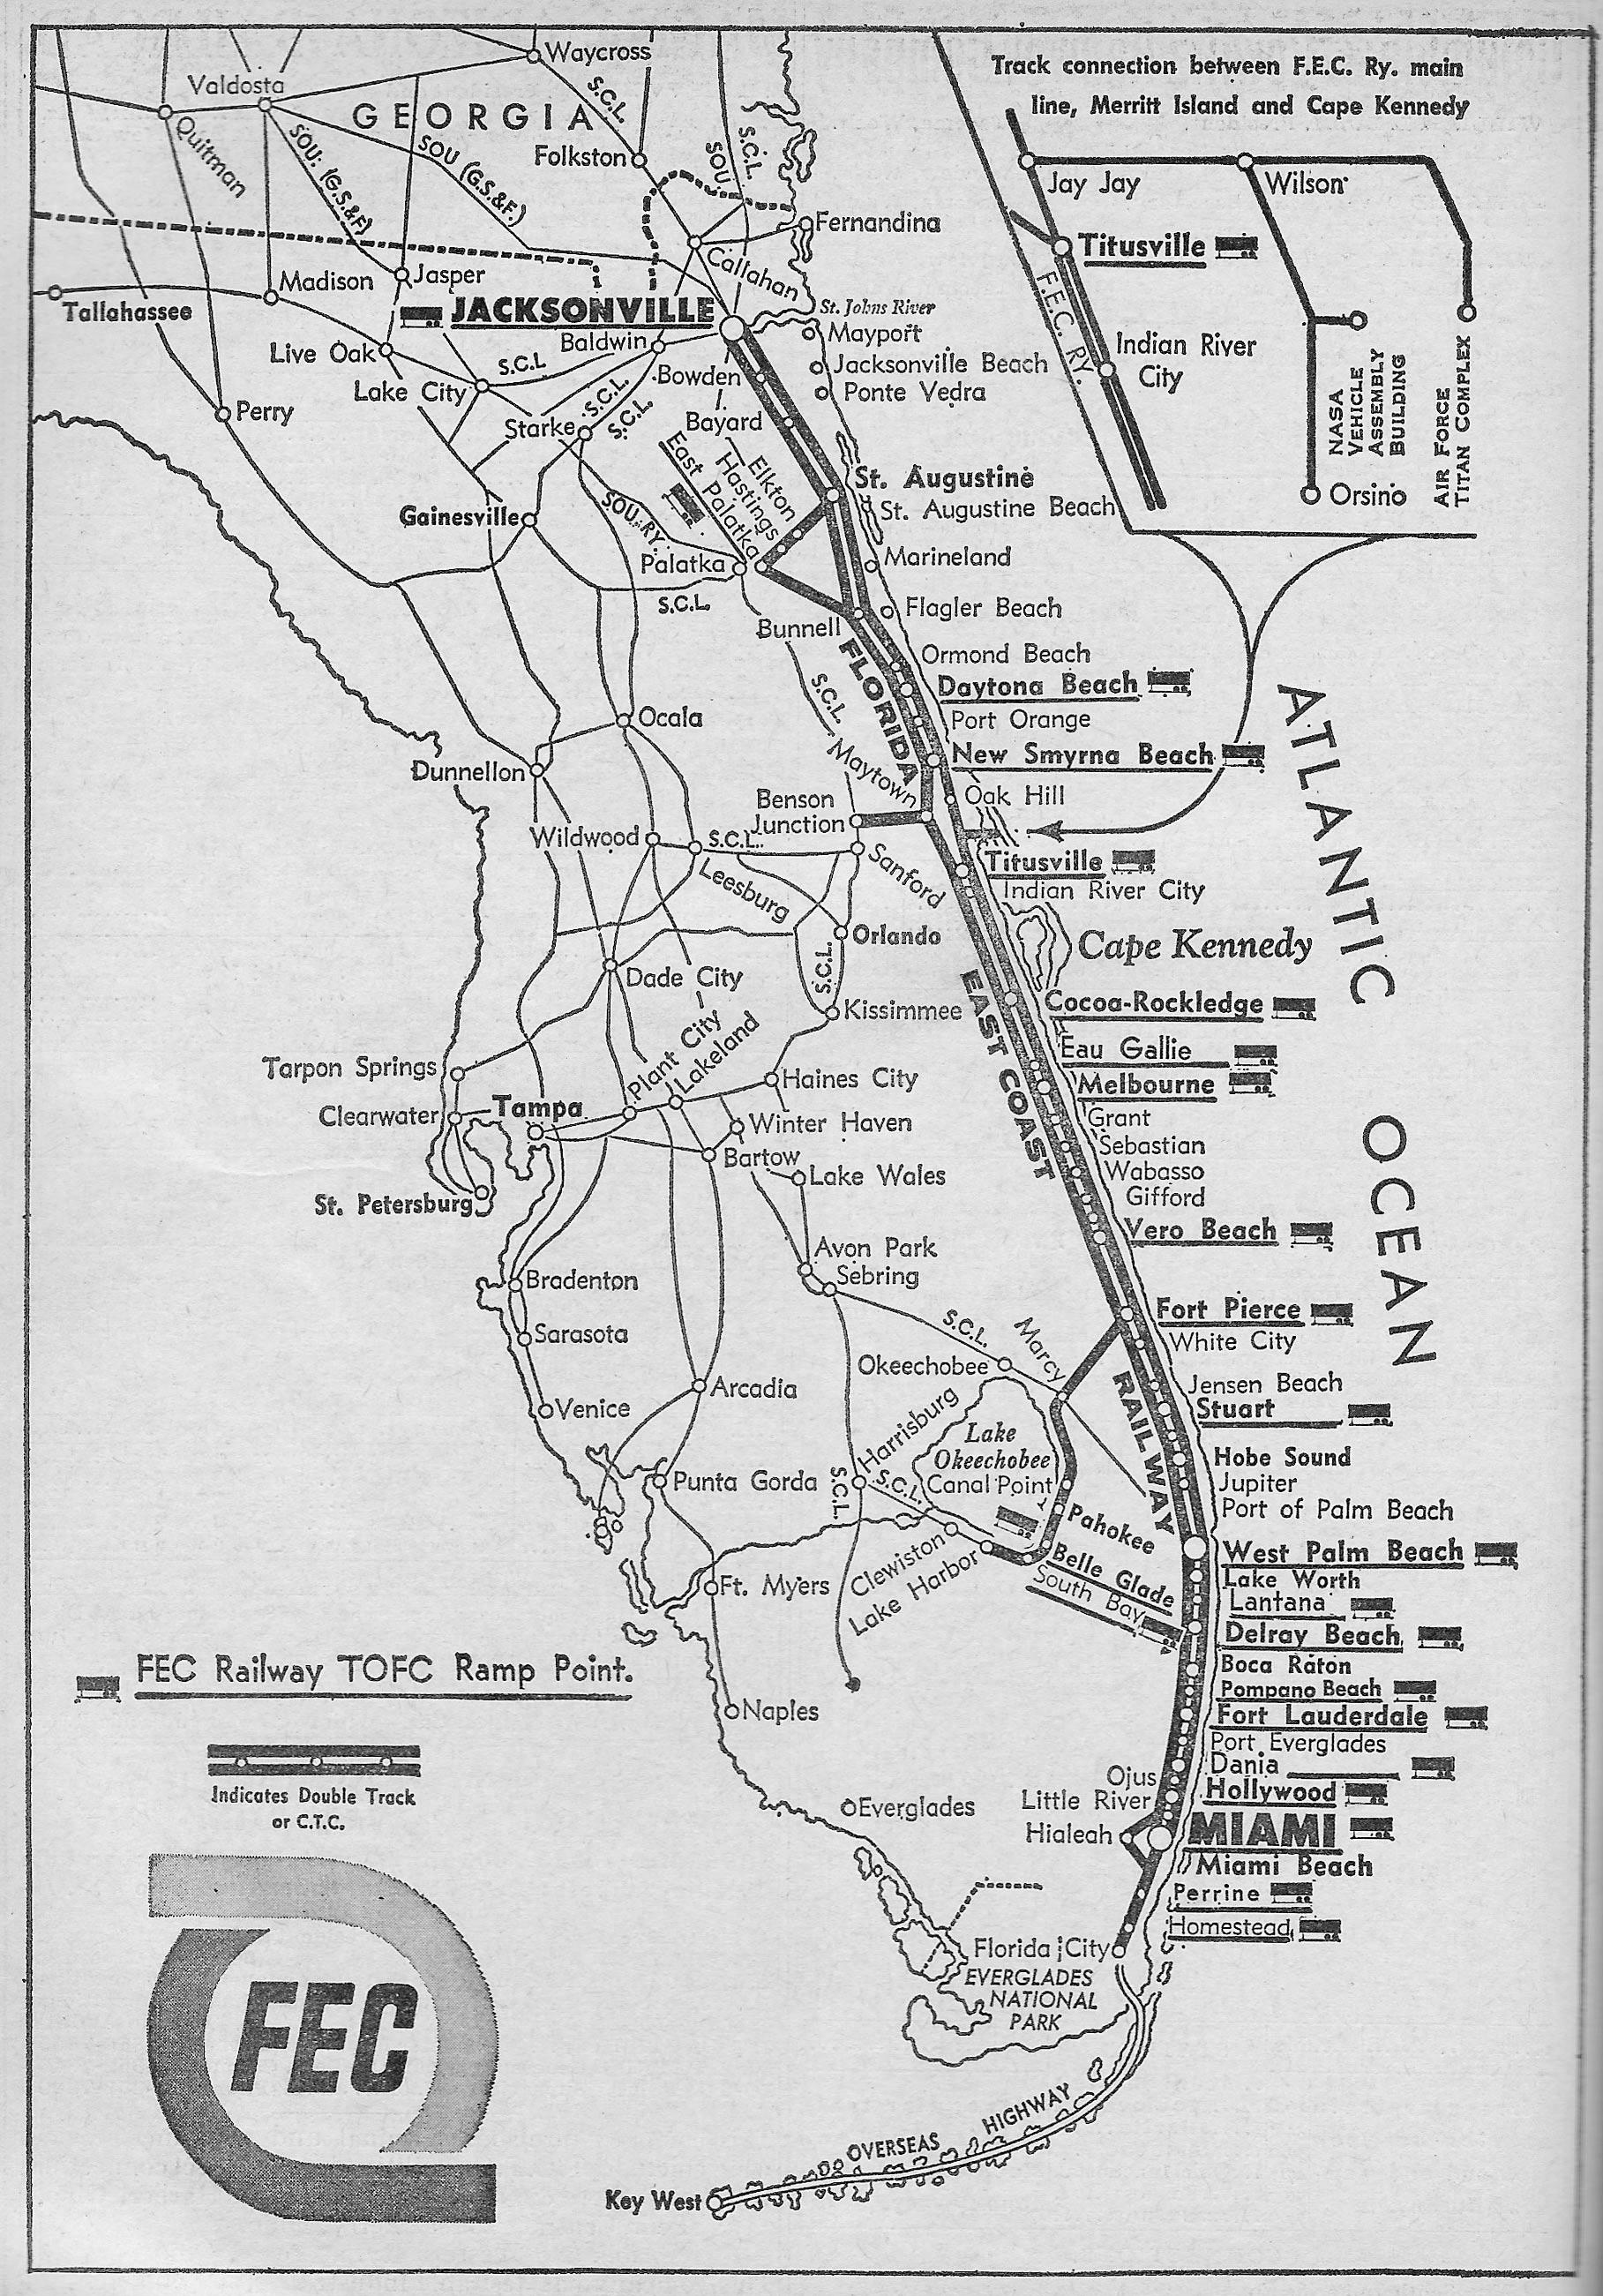 Building The Florida East Coast Railway